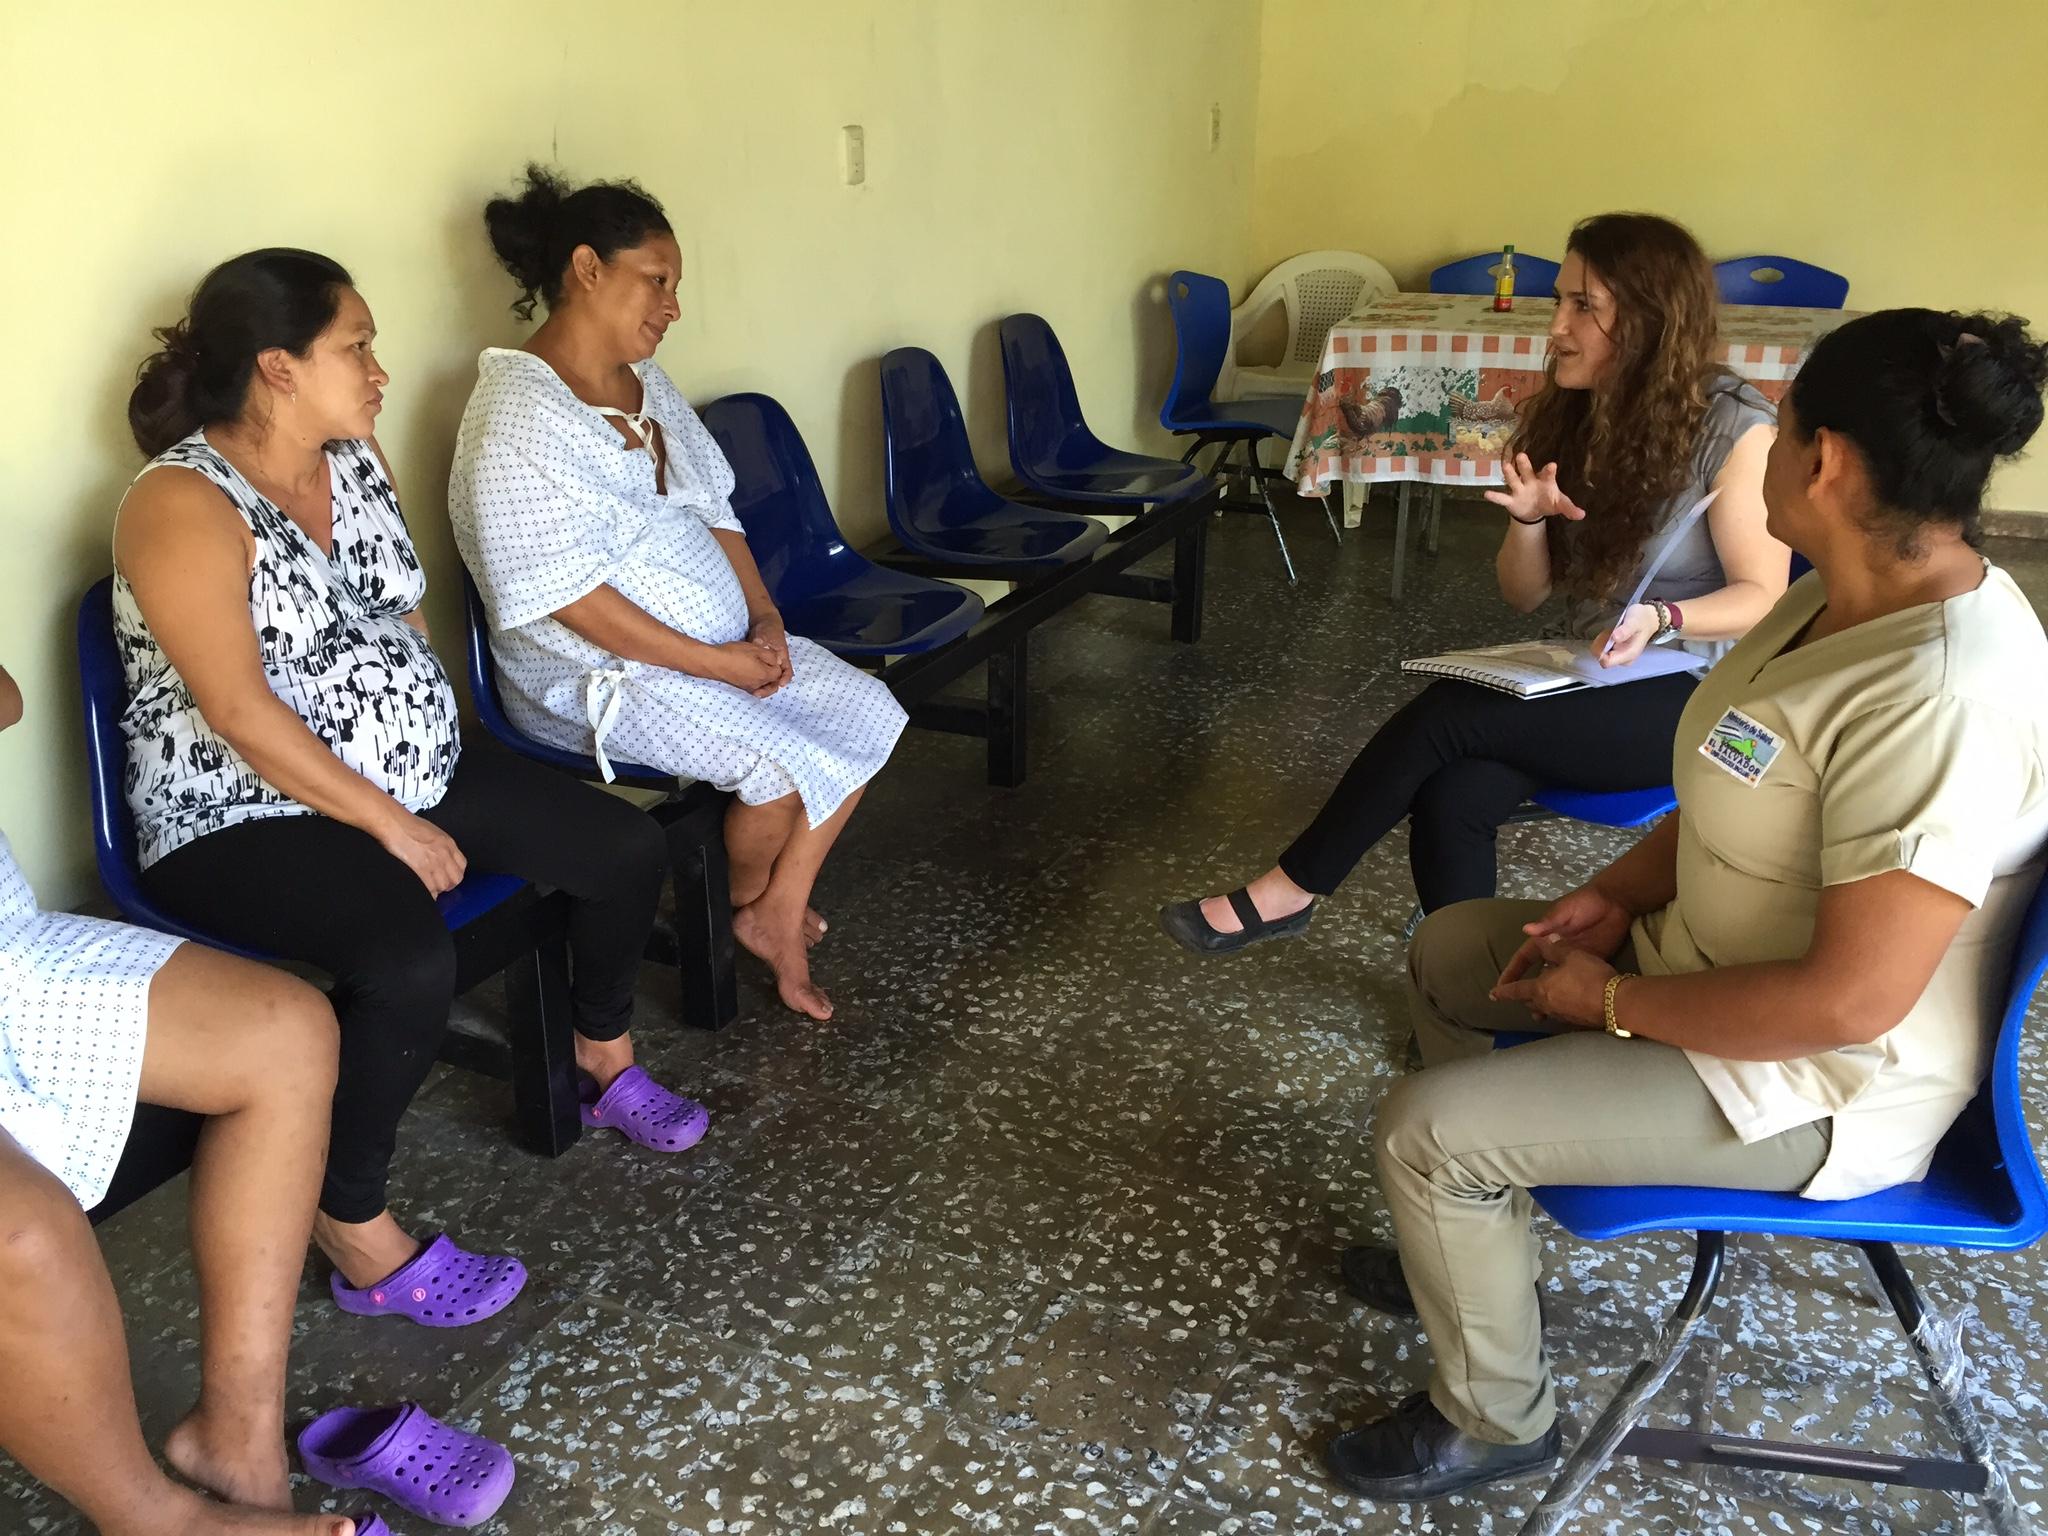 Brittany Girton teaches a reproductive health seminar in rural El Salvador with no translator.